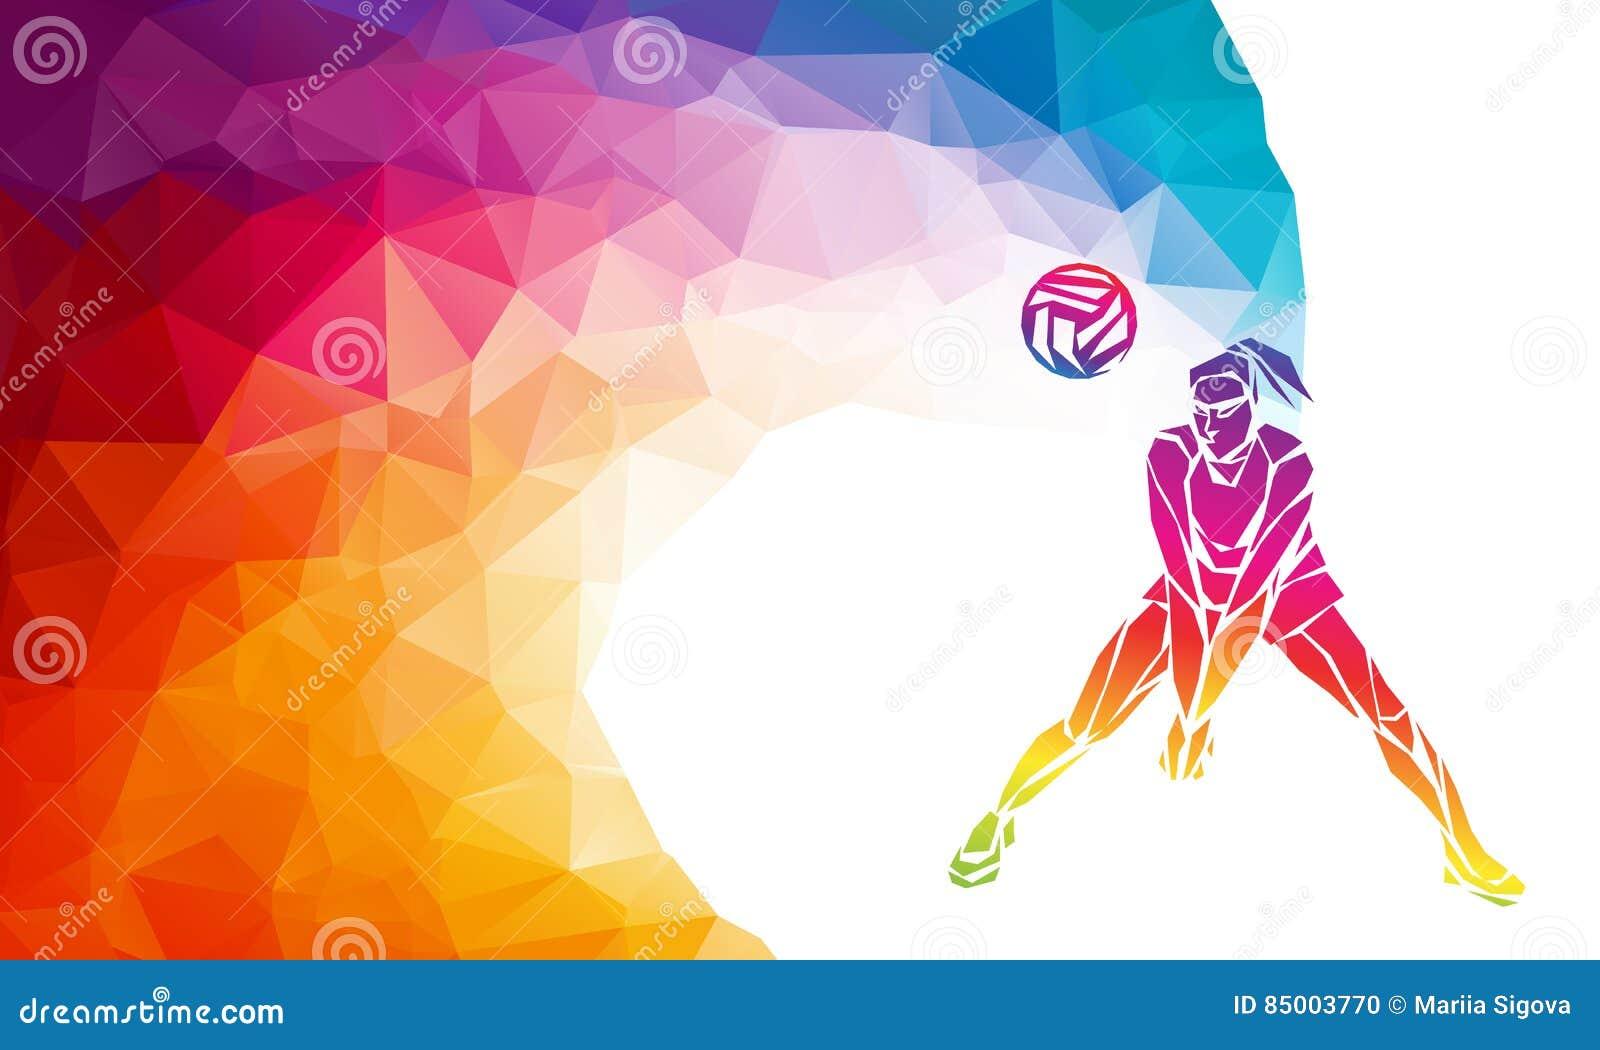 Abstract Triangle Volleyball Player Silhouette Stock: Joueur De Volleyball Bannière Polygonale De Vecteur De